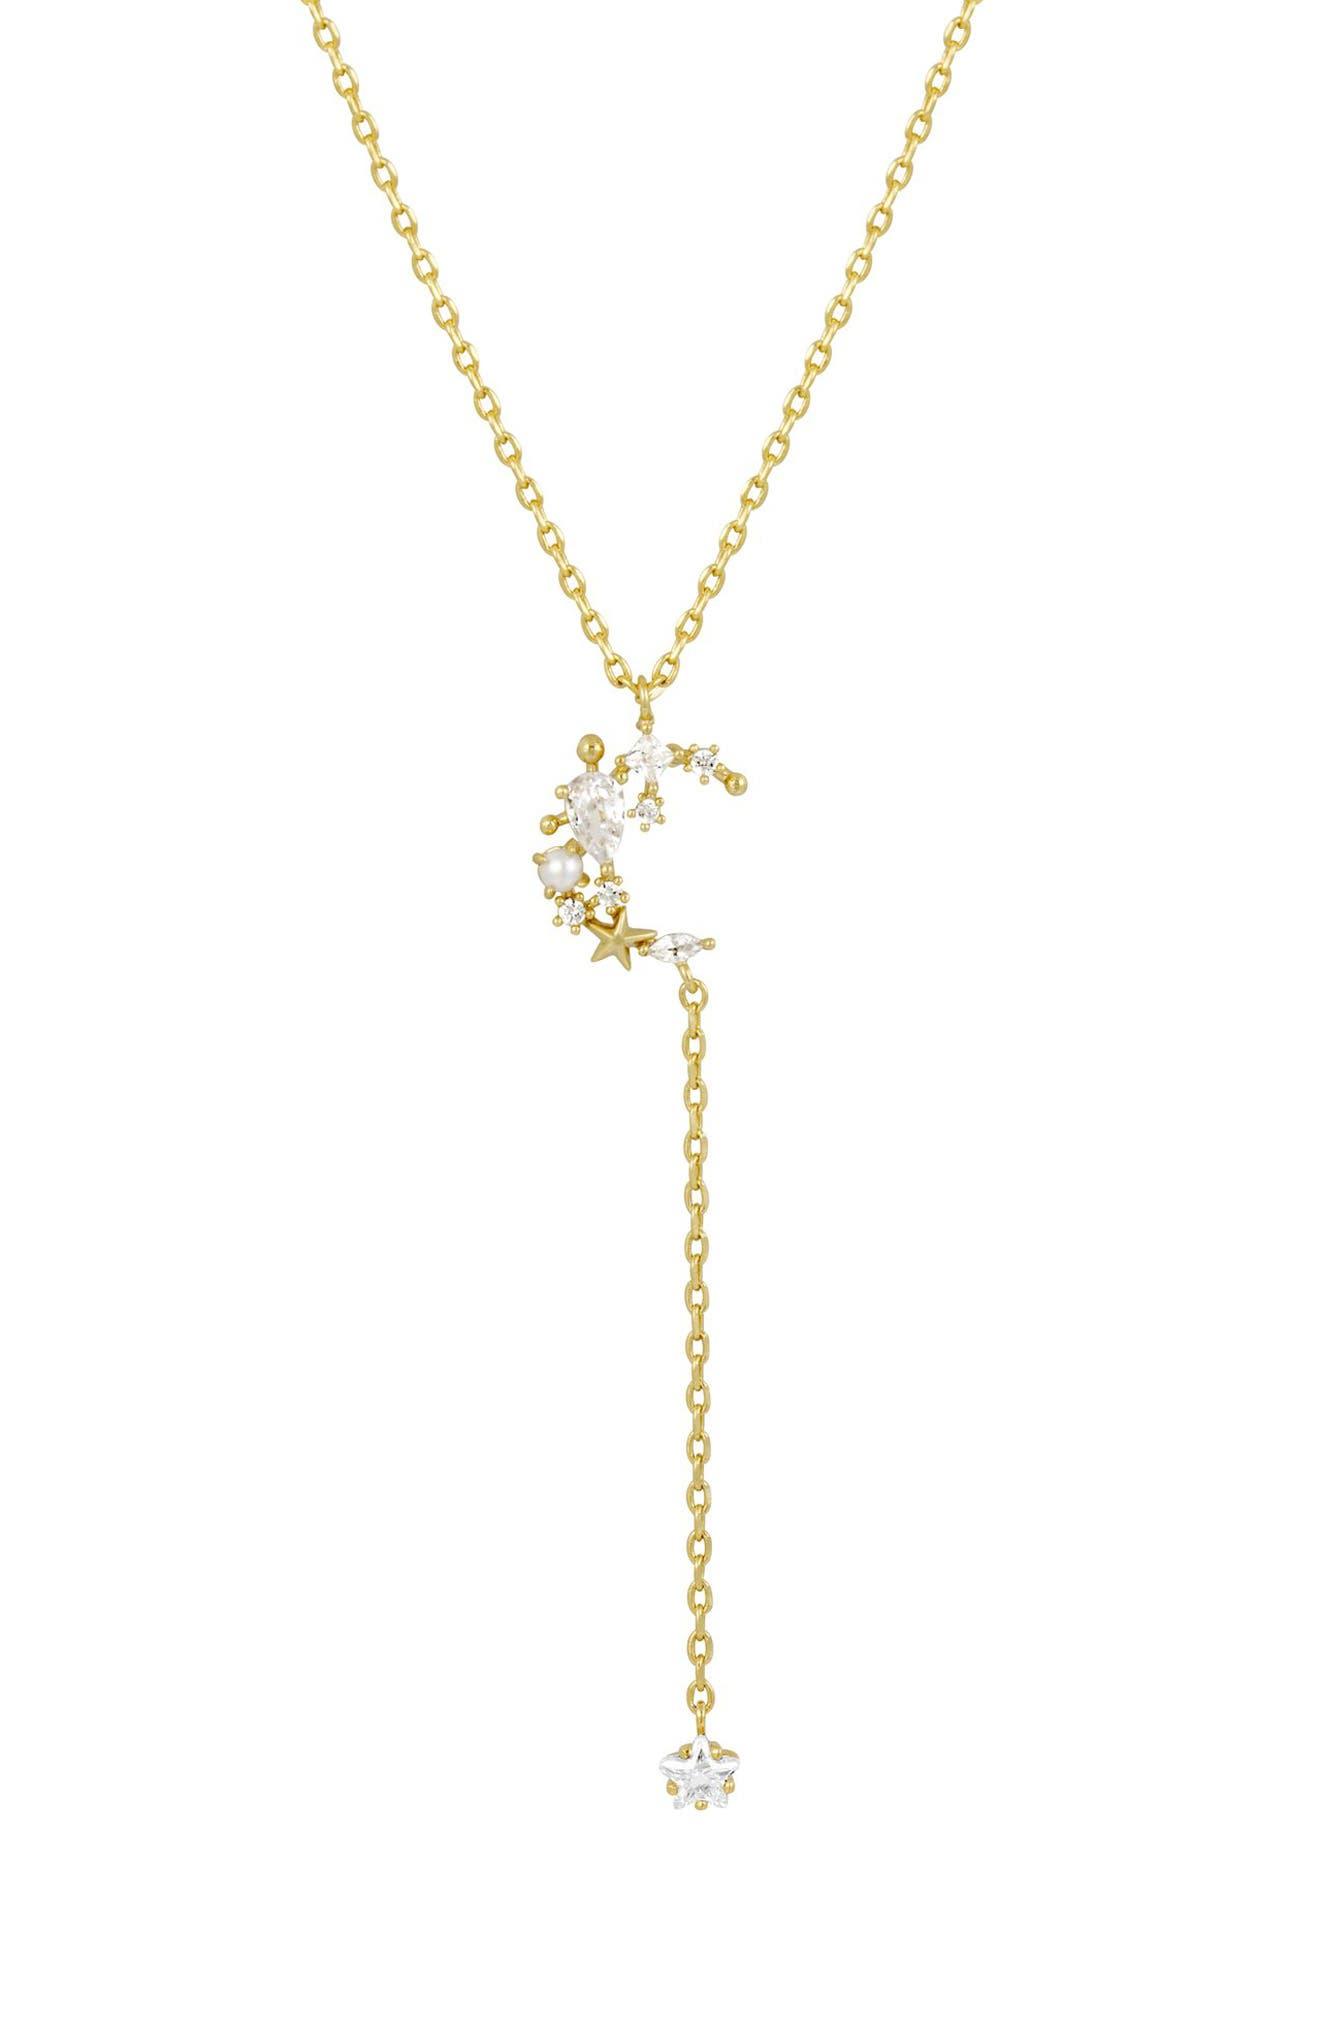 Midnight Dangle Y-Necklace